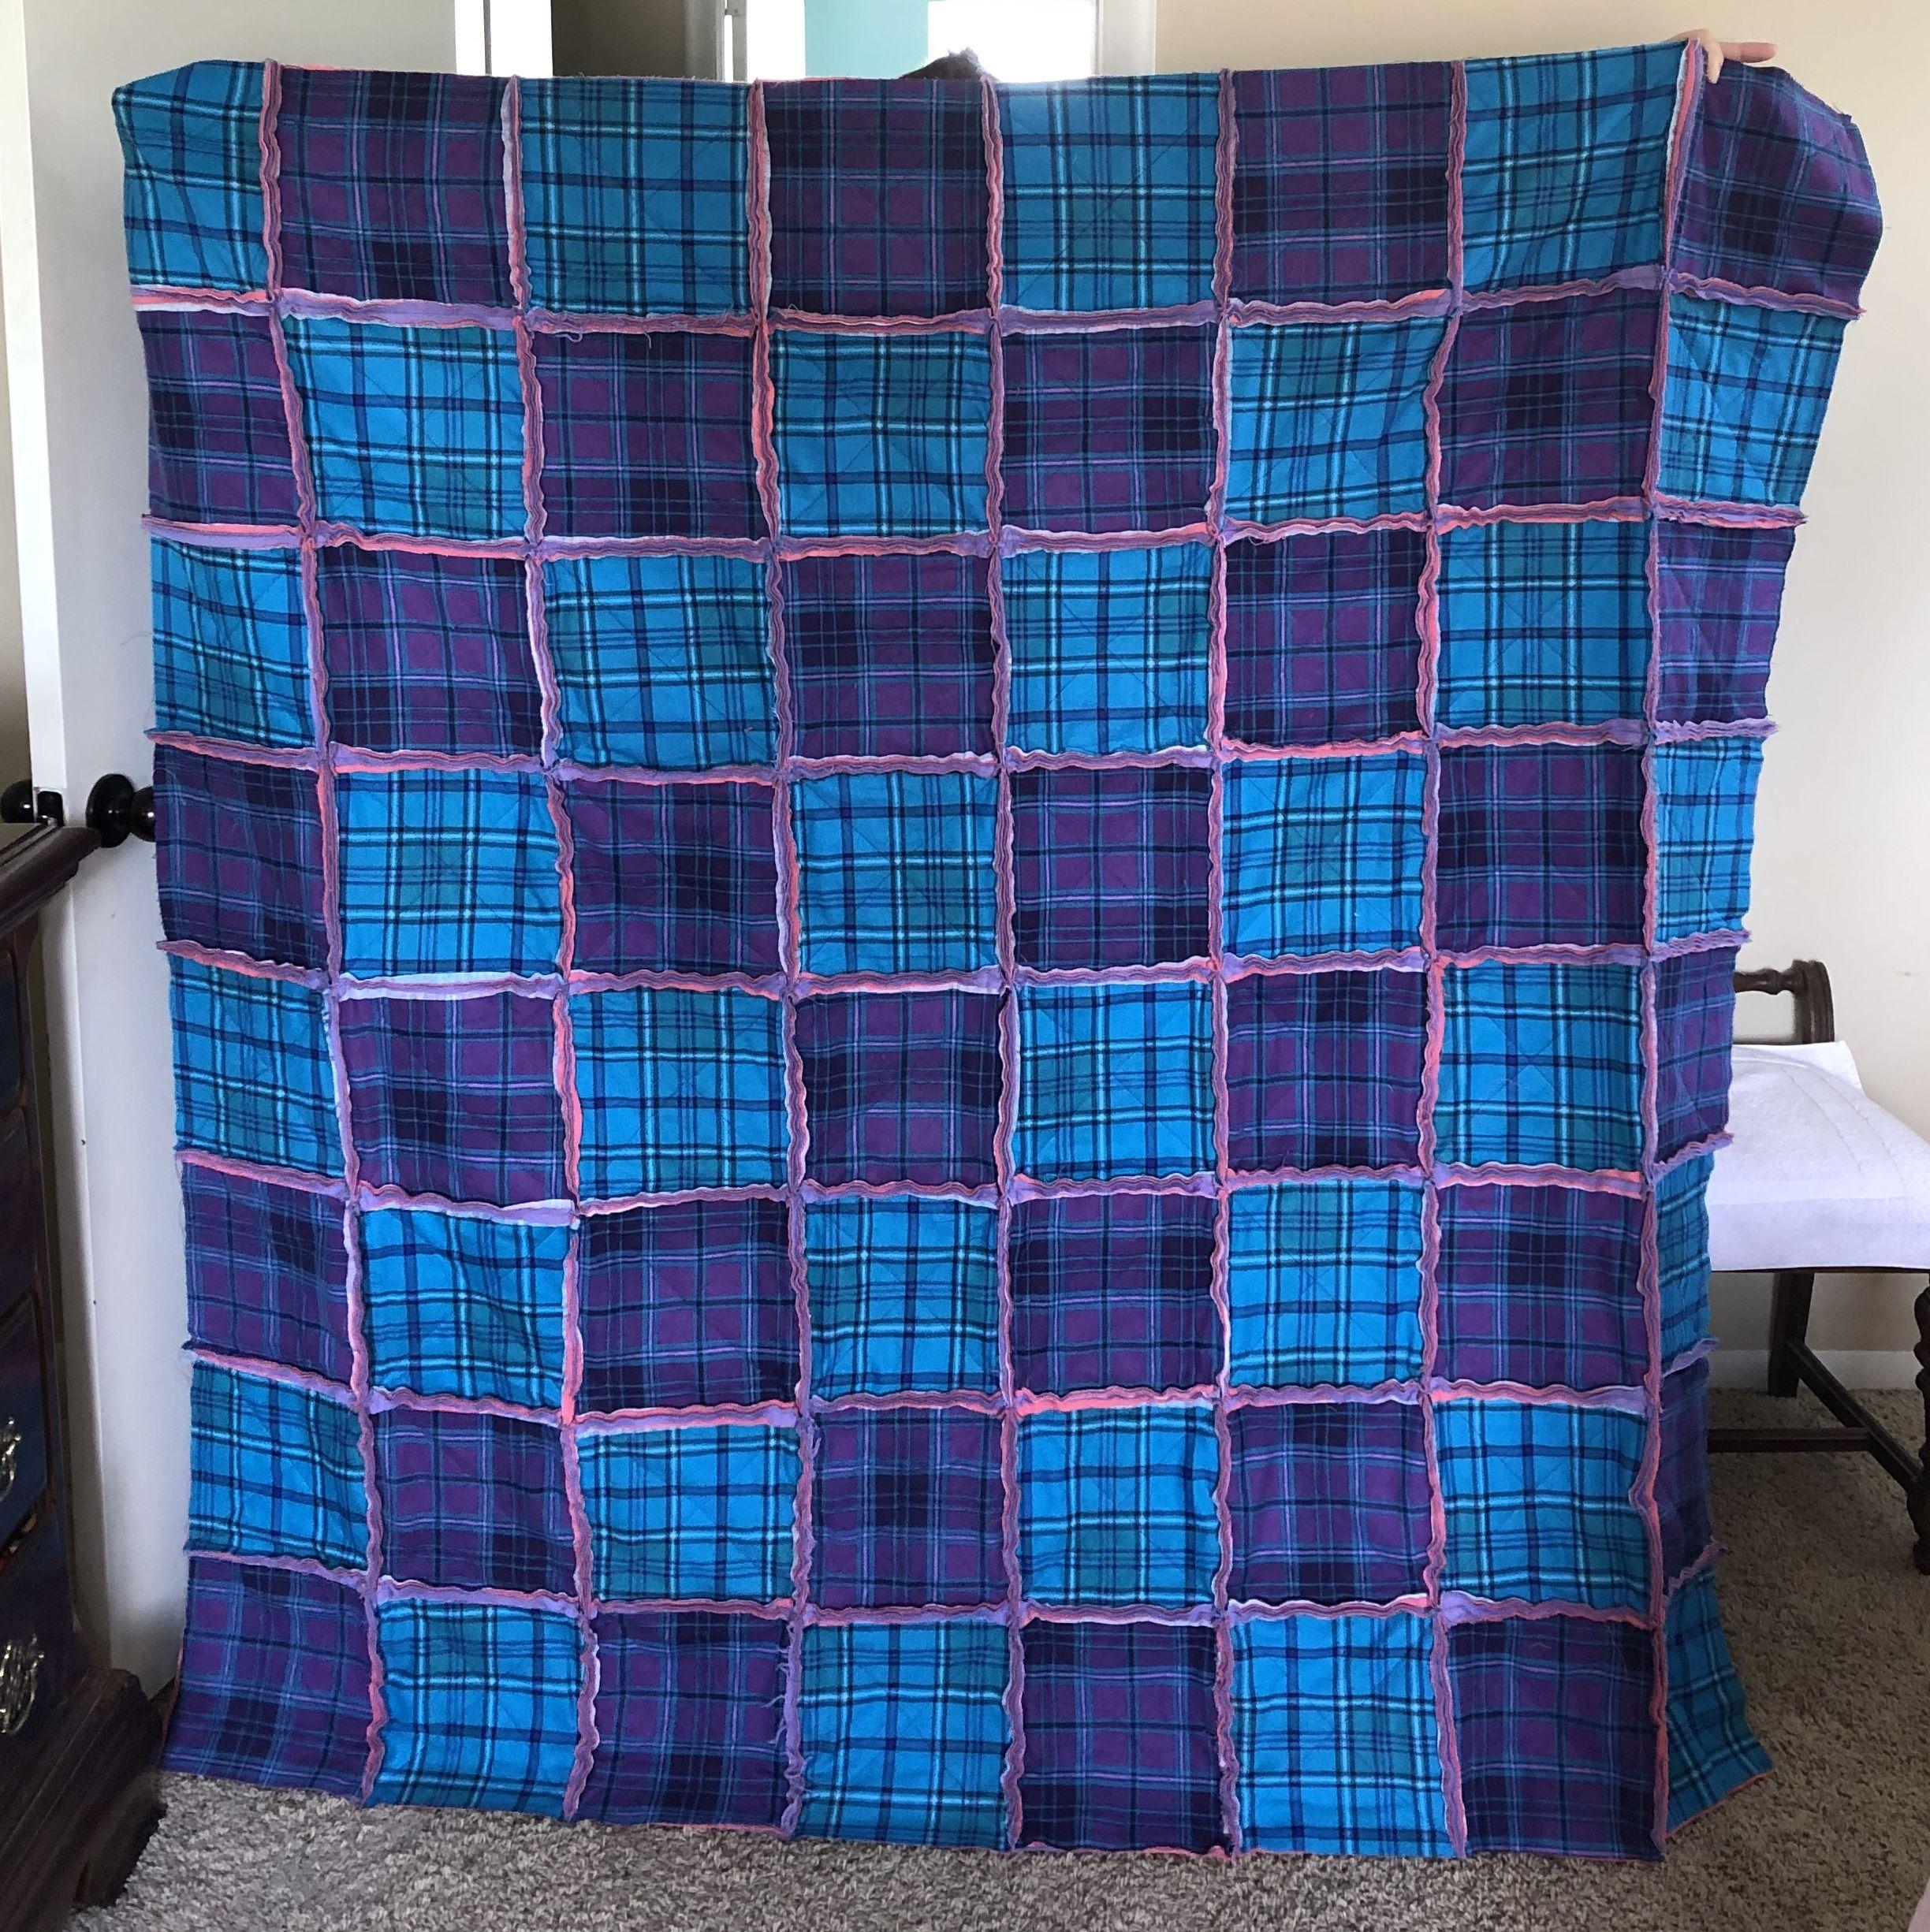 2019 rag quilt retirement gift rag quilt retirement